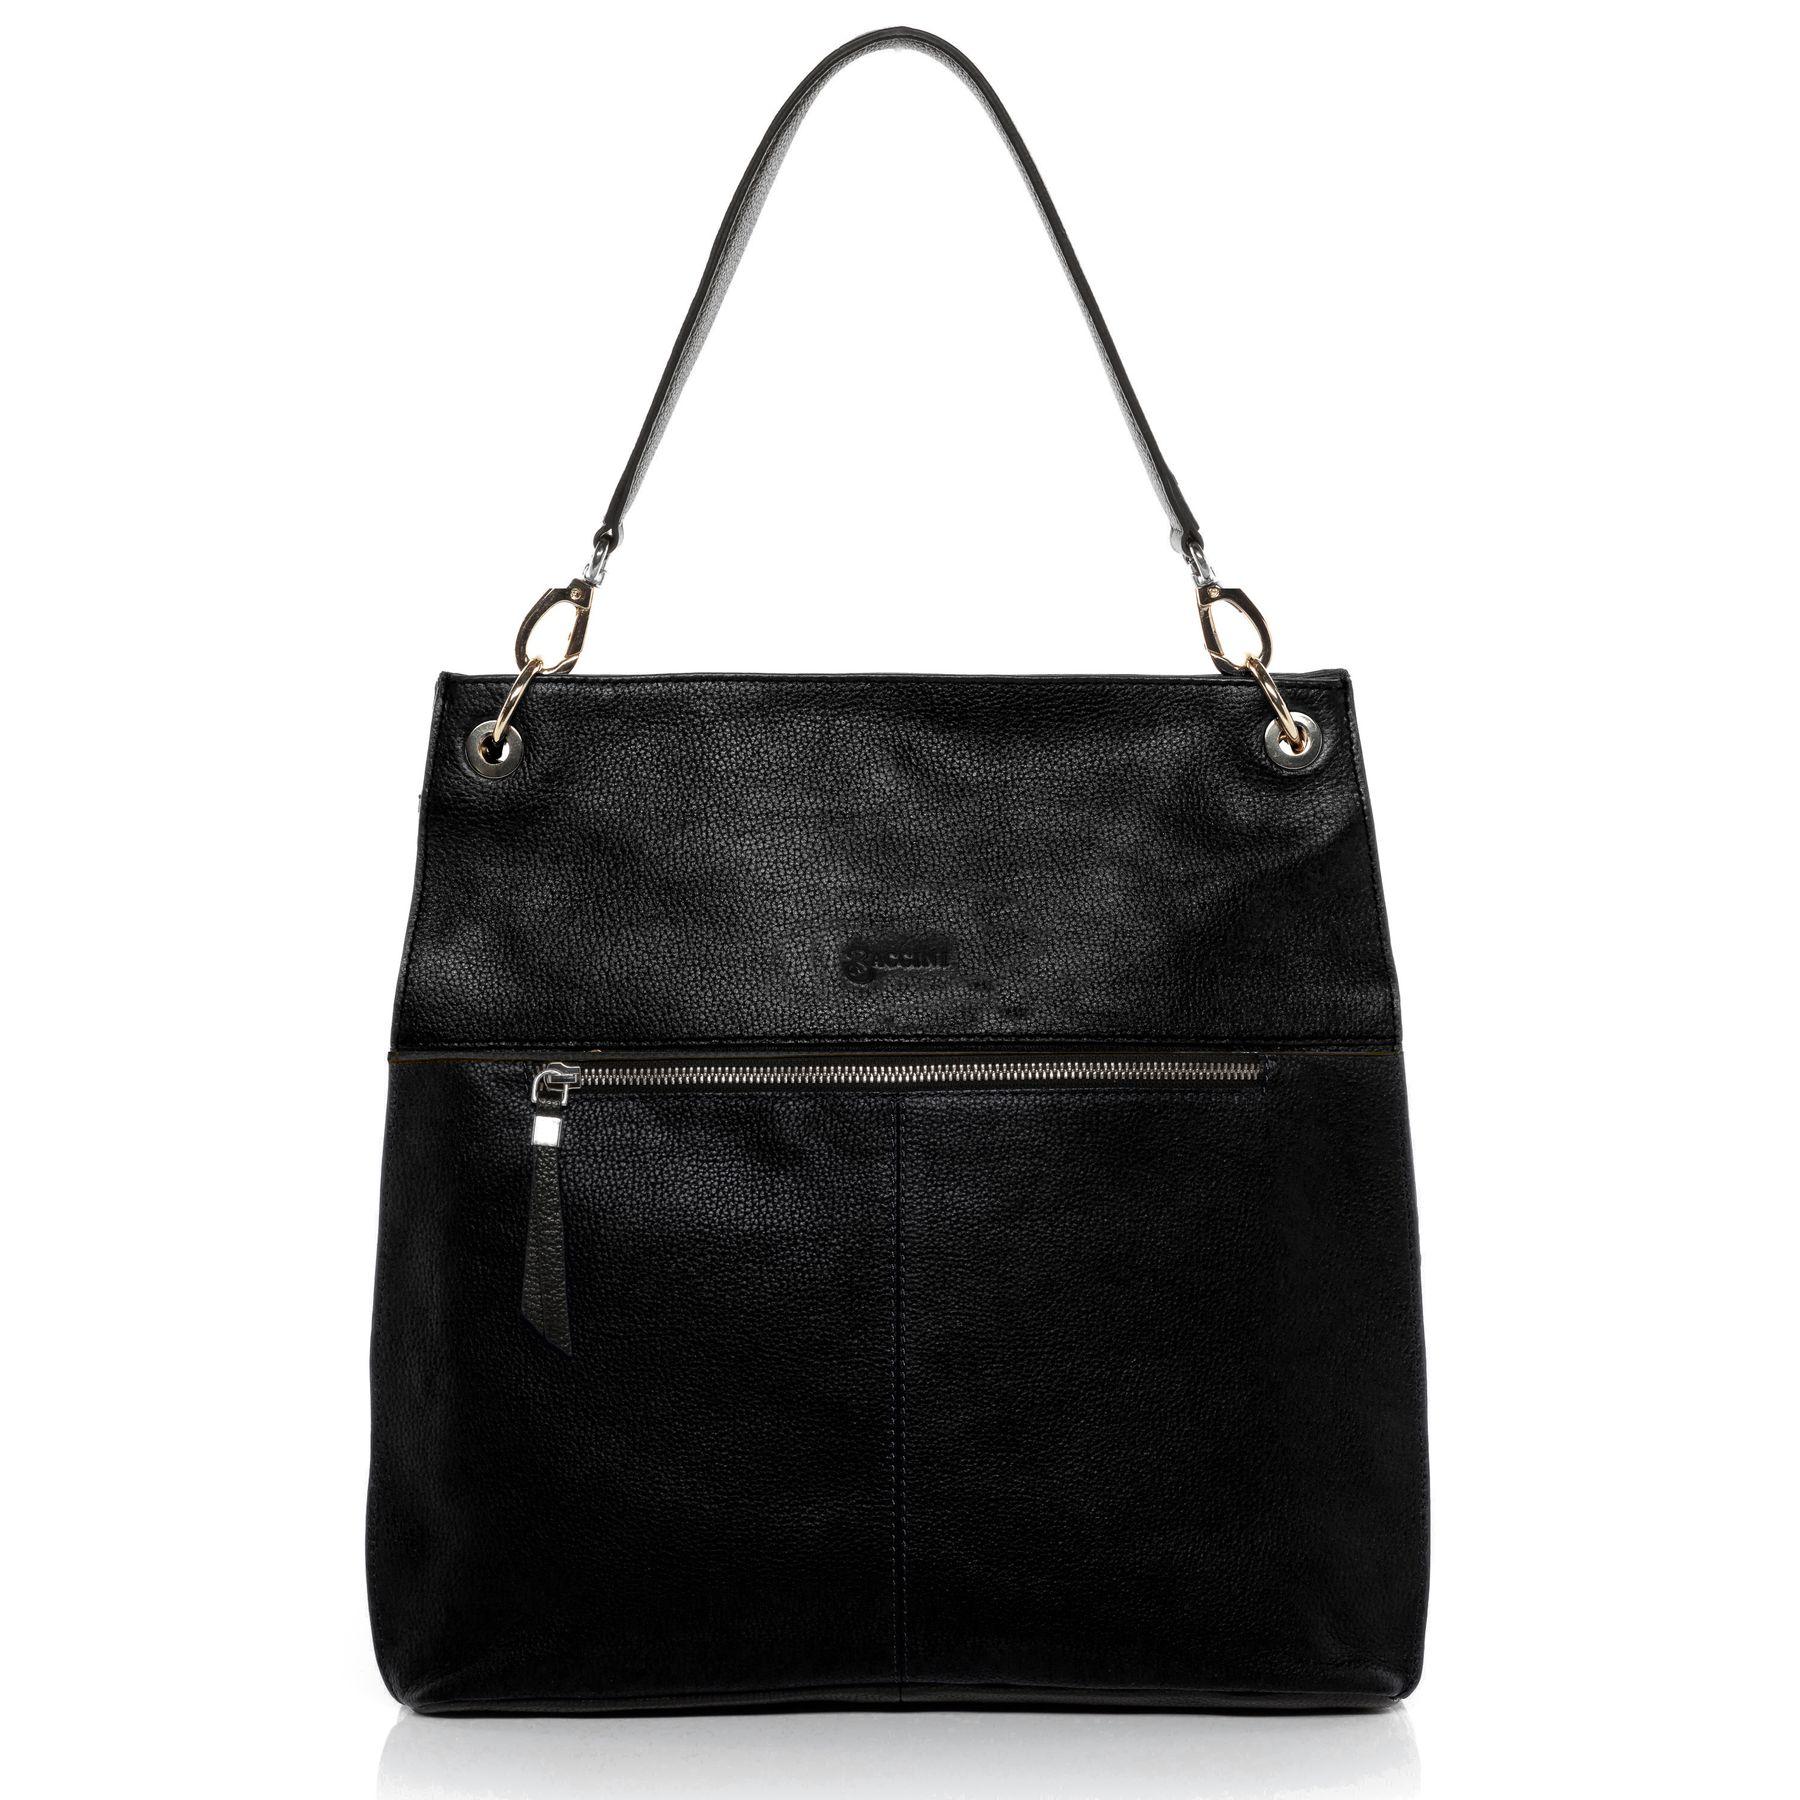 b36d319df6 SID   VAIN Shoulder bag   Cross-body bag Smooth Leather YANN black Tote bag  handbag Top-handle bag New